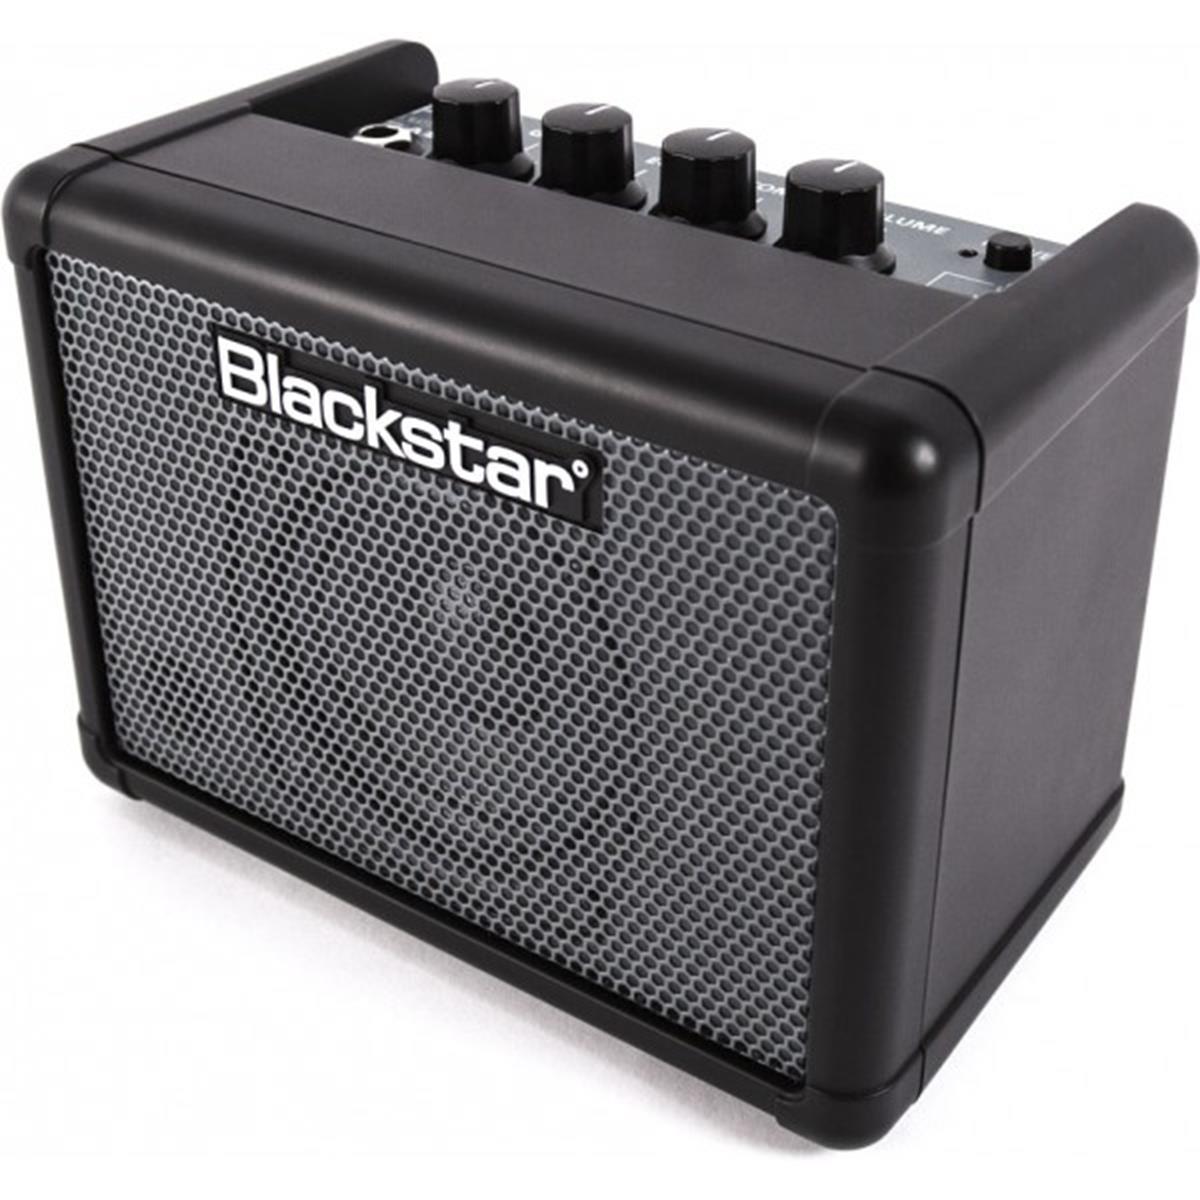 BLACKSTAR-FLY3-BASS-MINI-AMPLIFICATORE-PER-BASSO-sku-16732